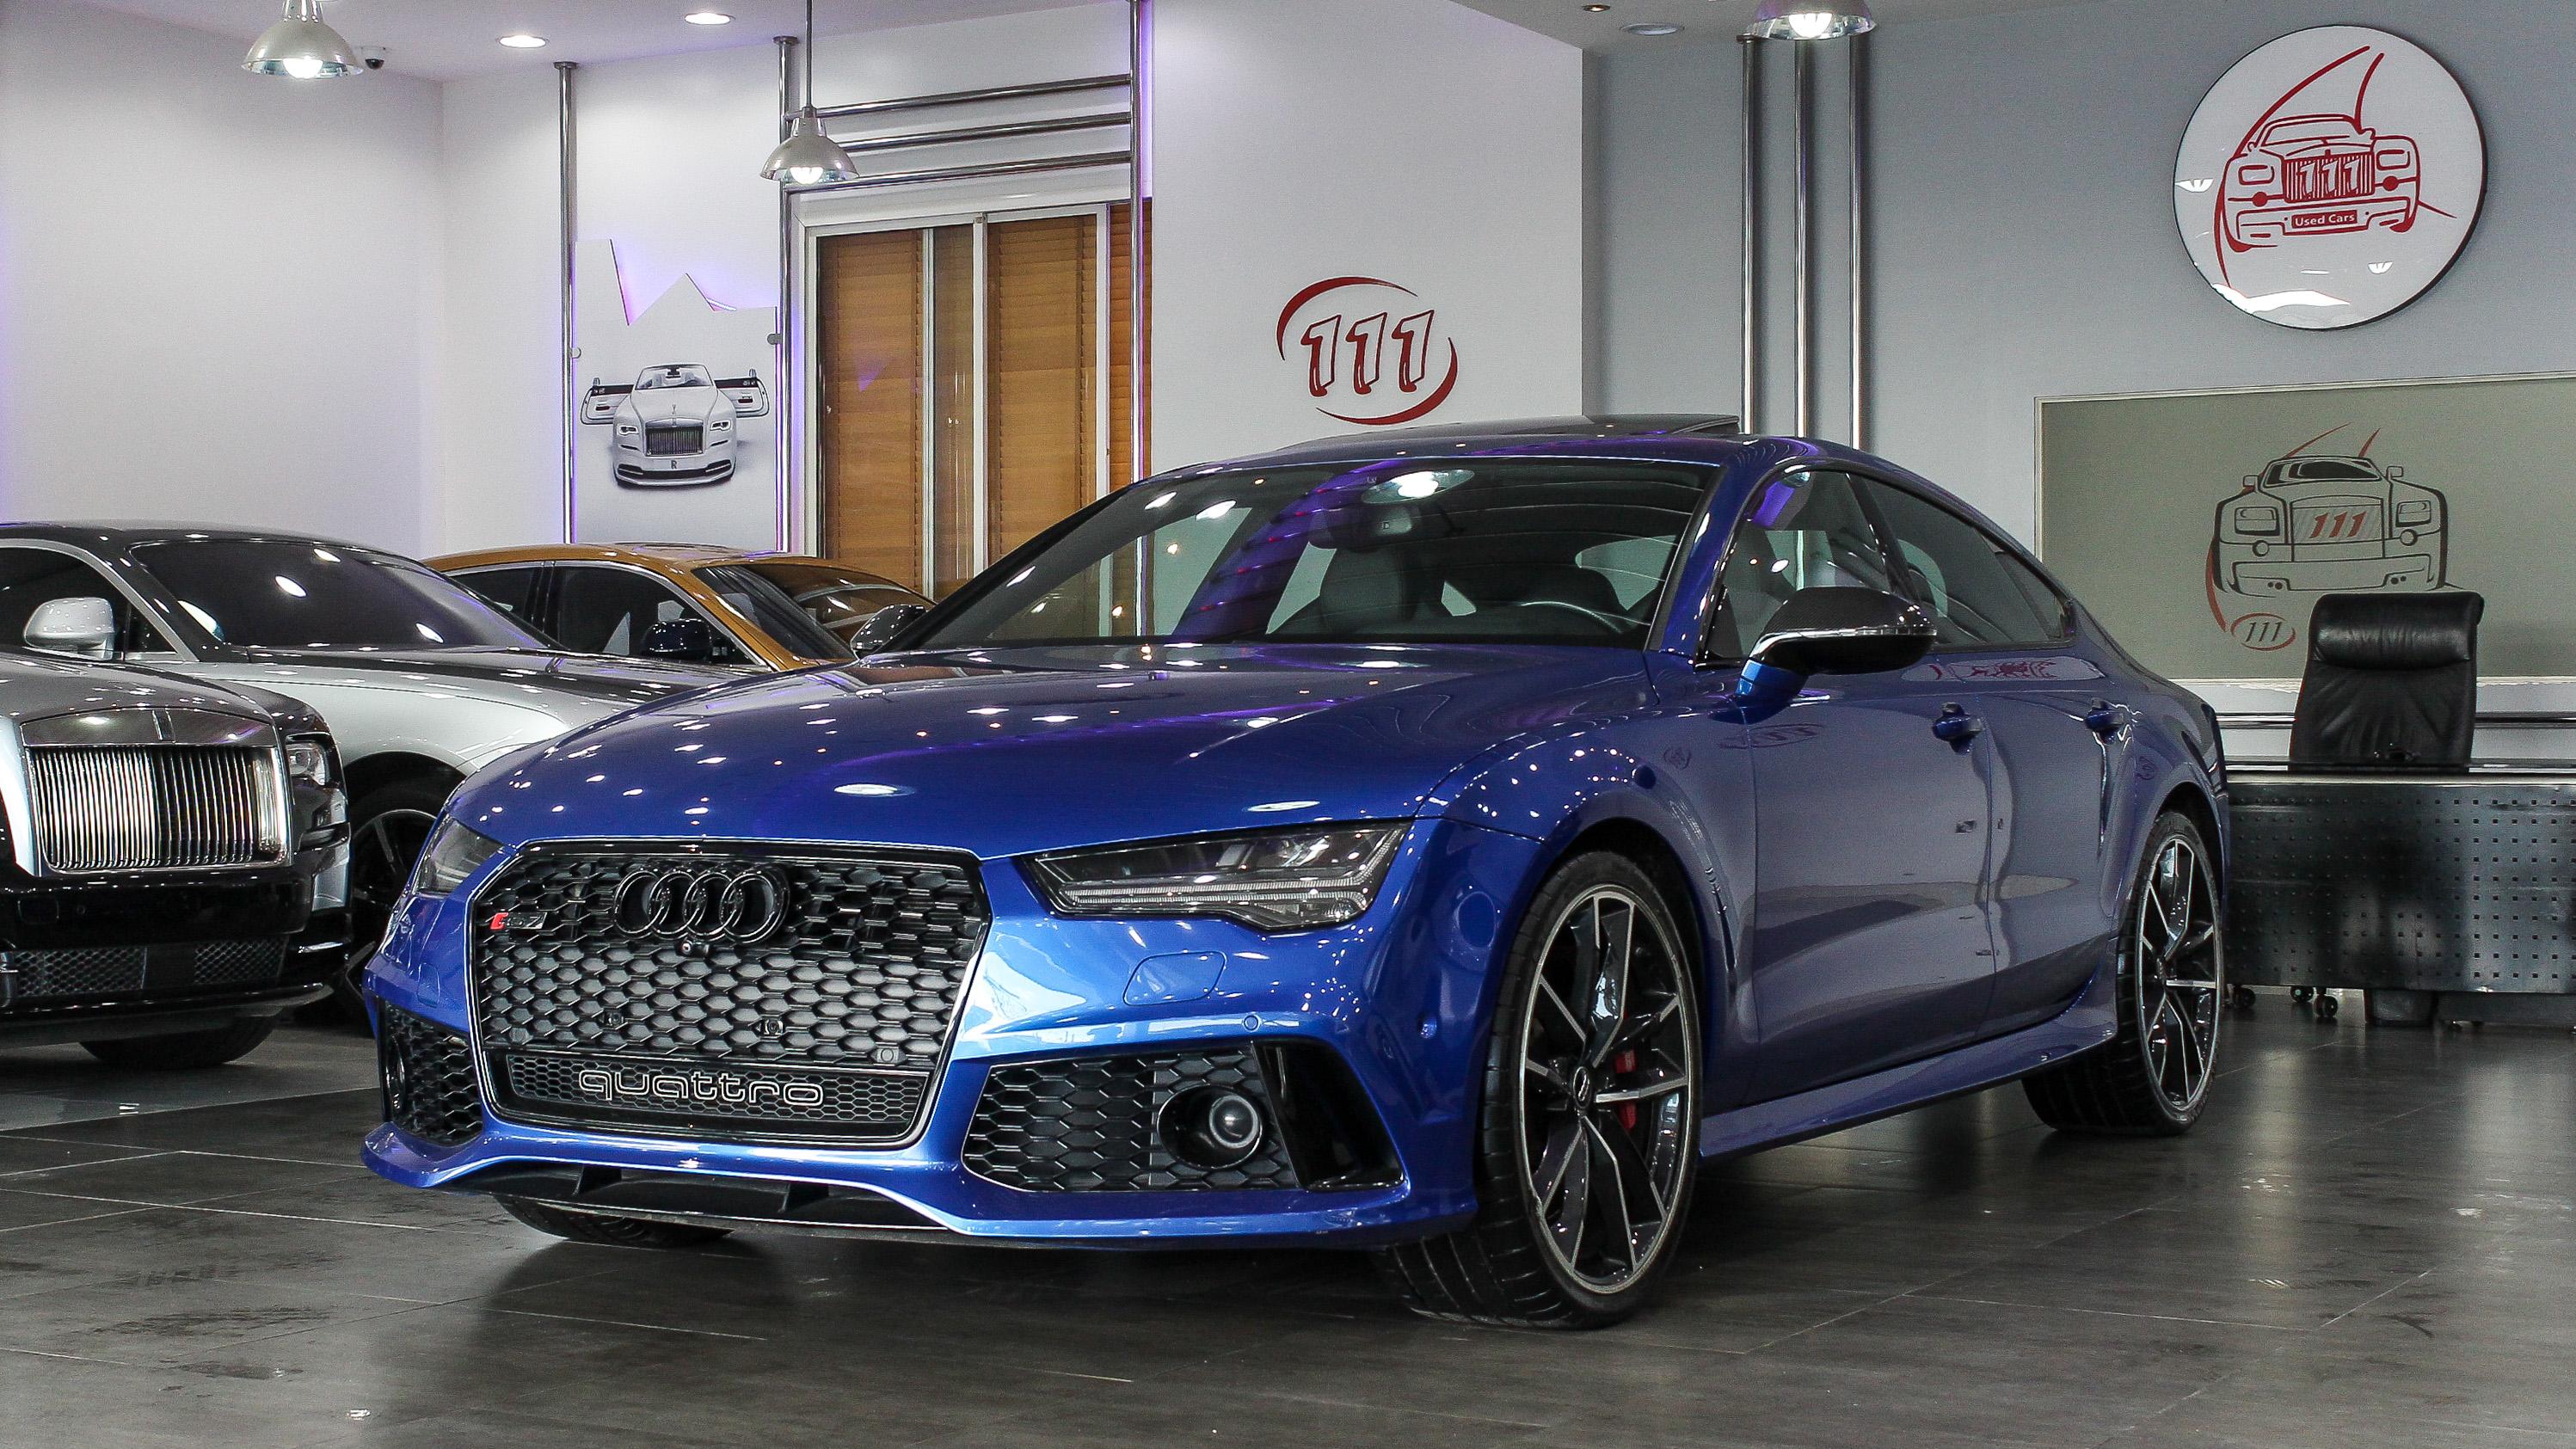 2016-Audi-RS7-Blue-Black-GCC-01.jpg